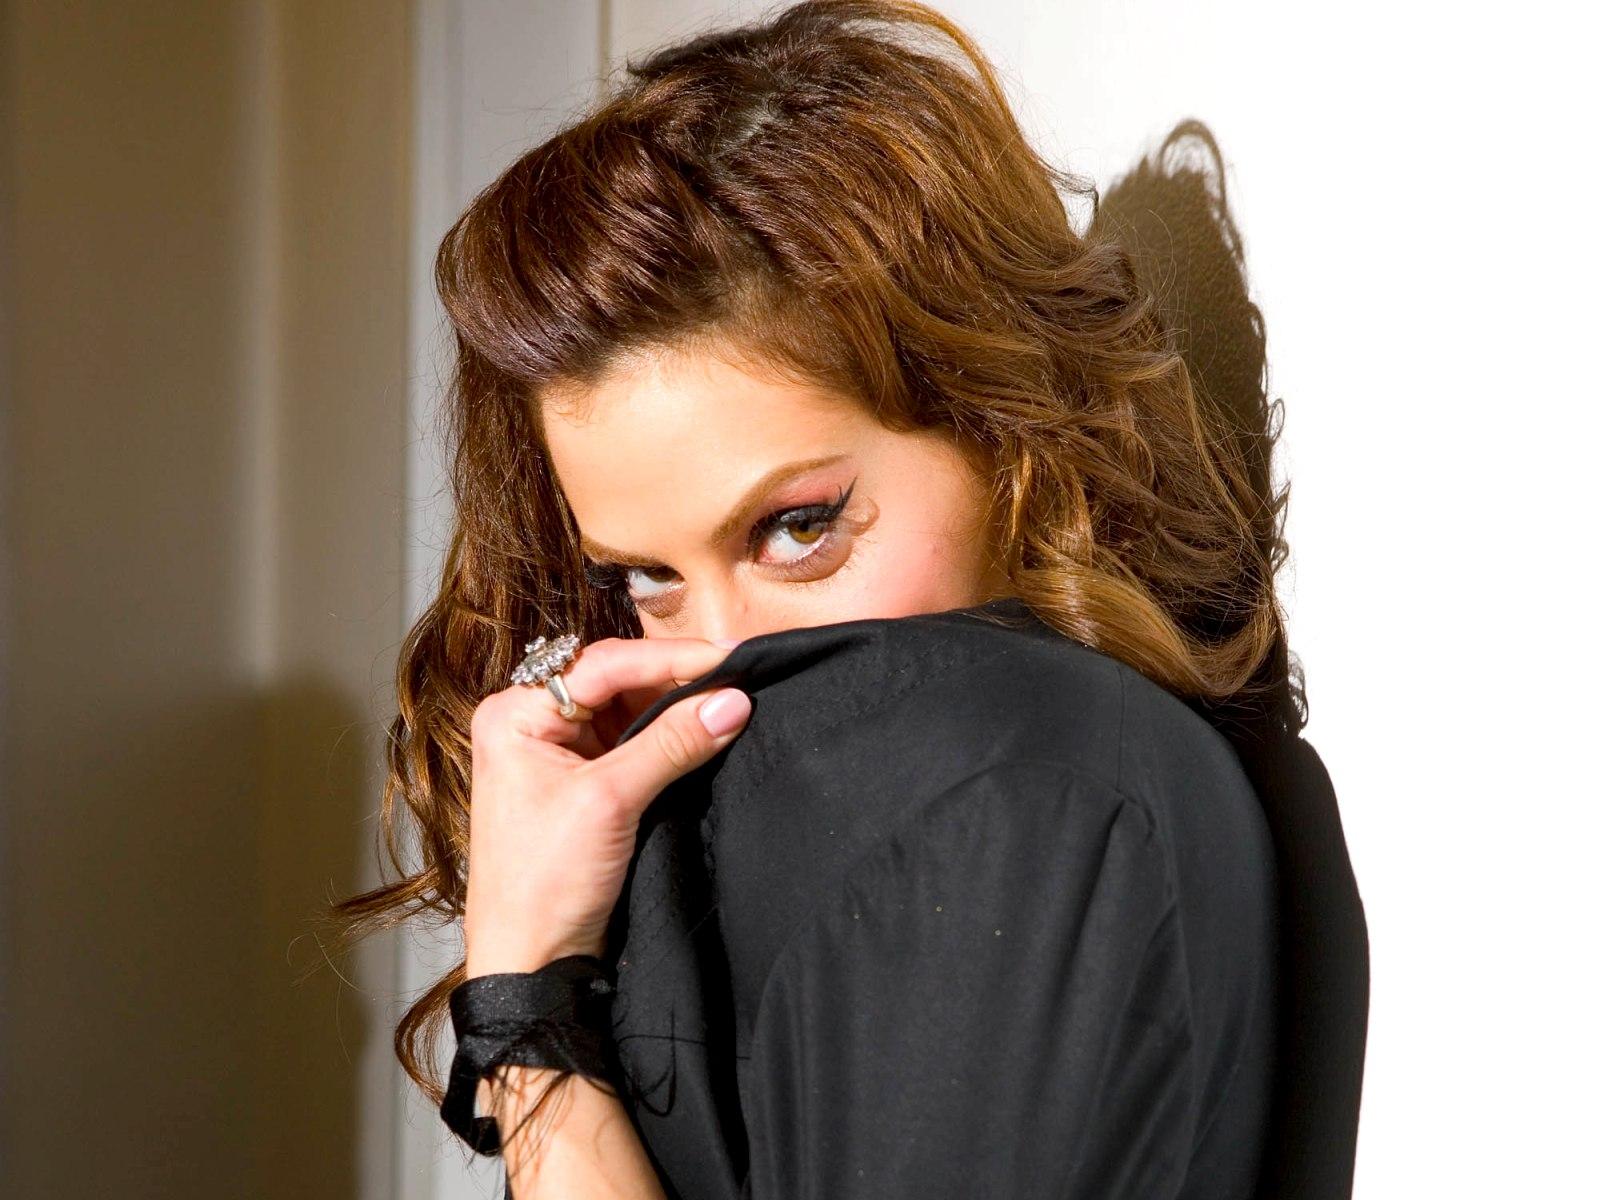 Фотография Brittany Murphy Знаменитости 1600x1200 Бриттани Мерфи